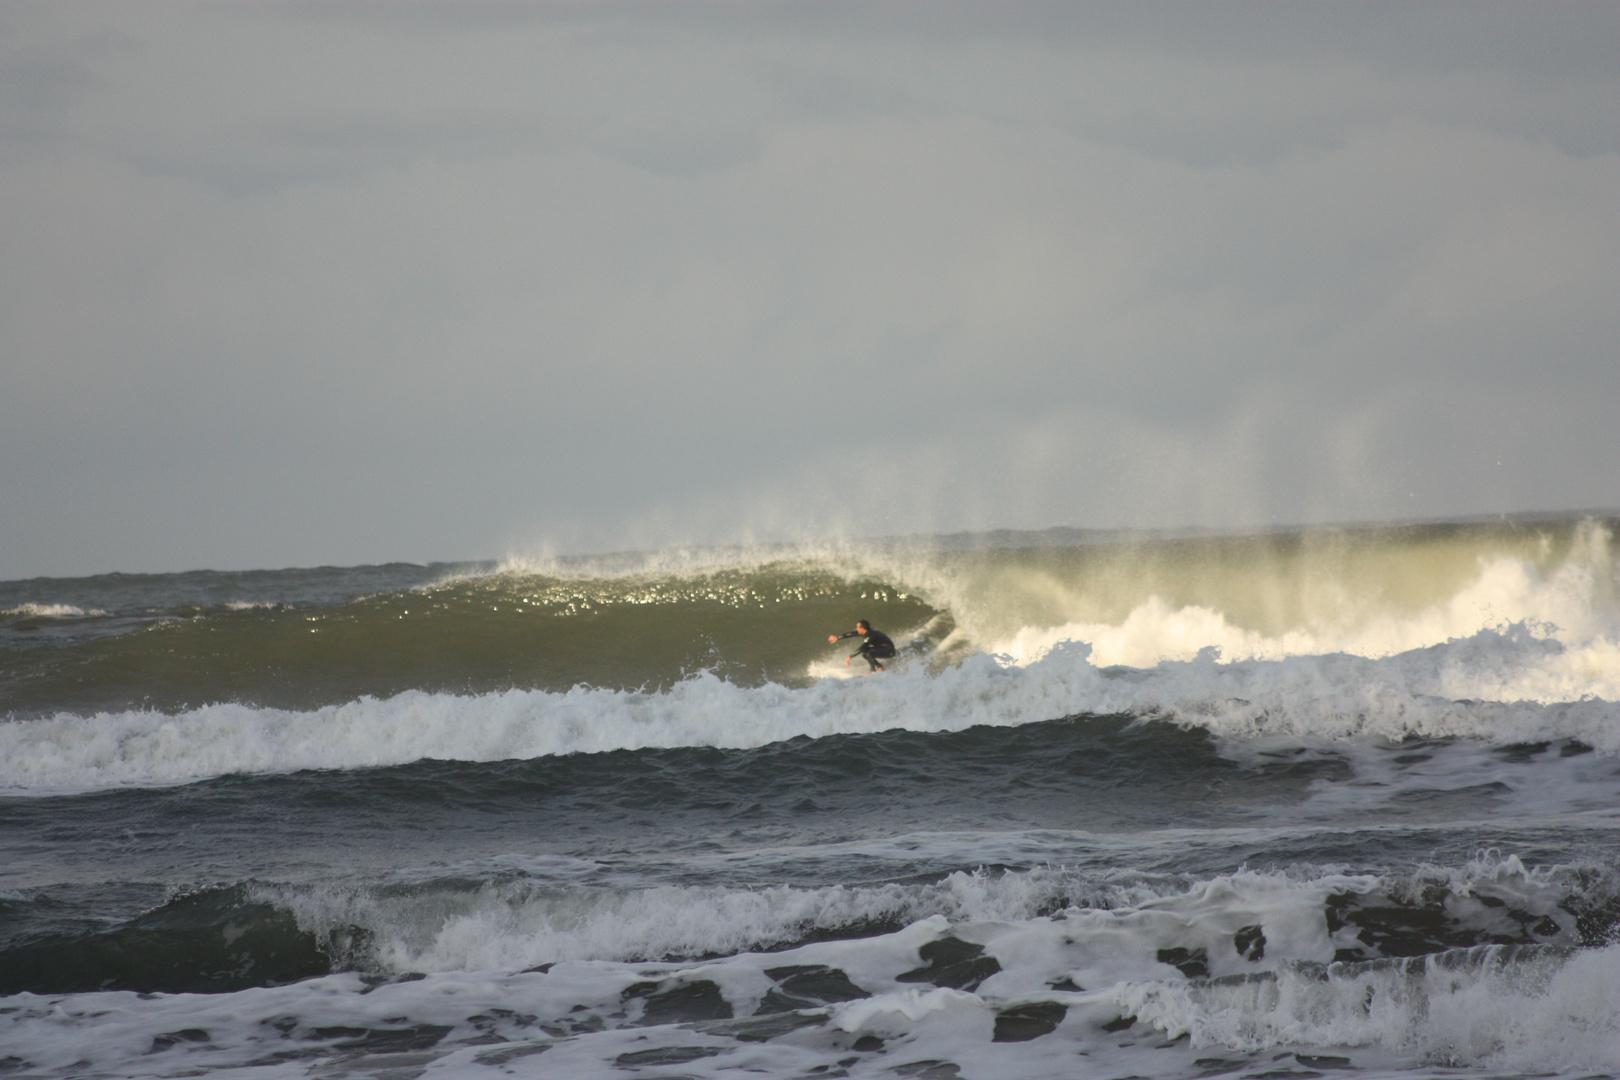 olas no aptas para surfear